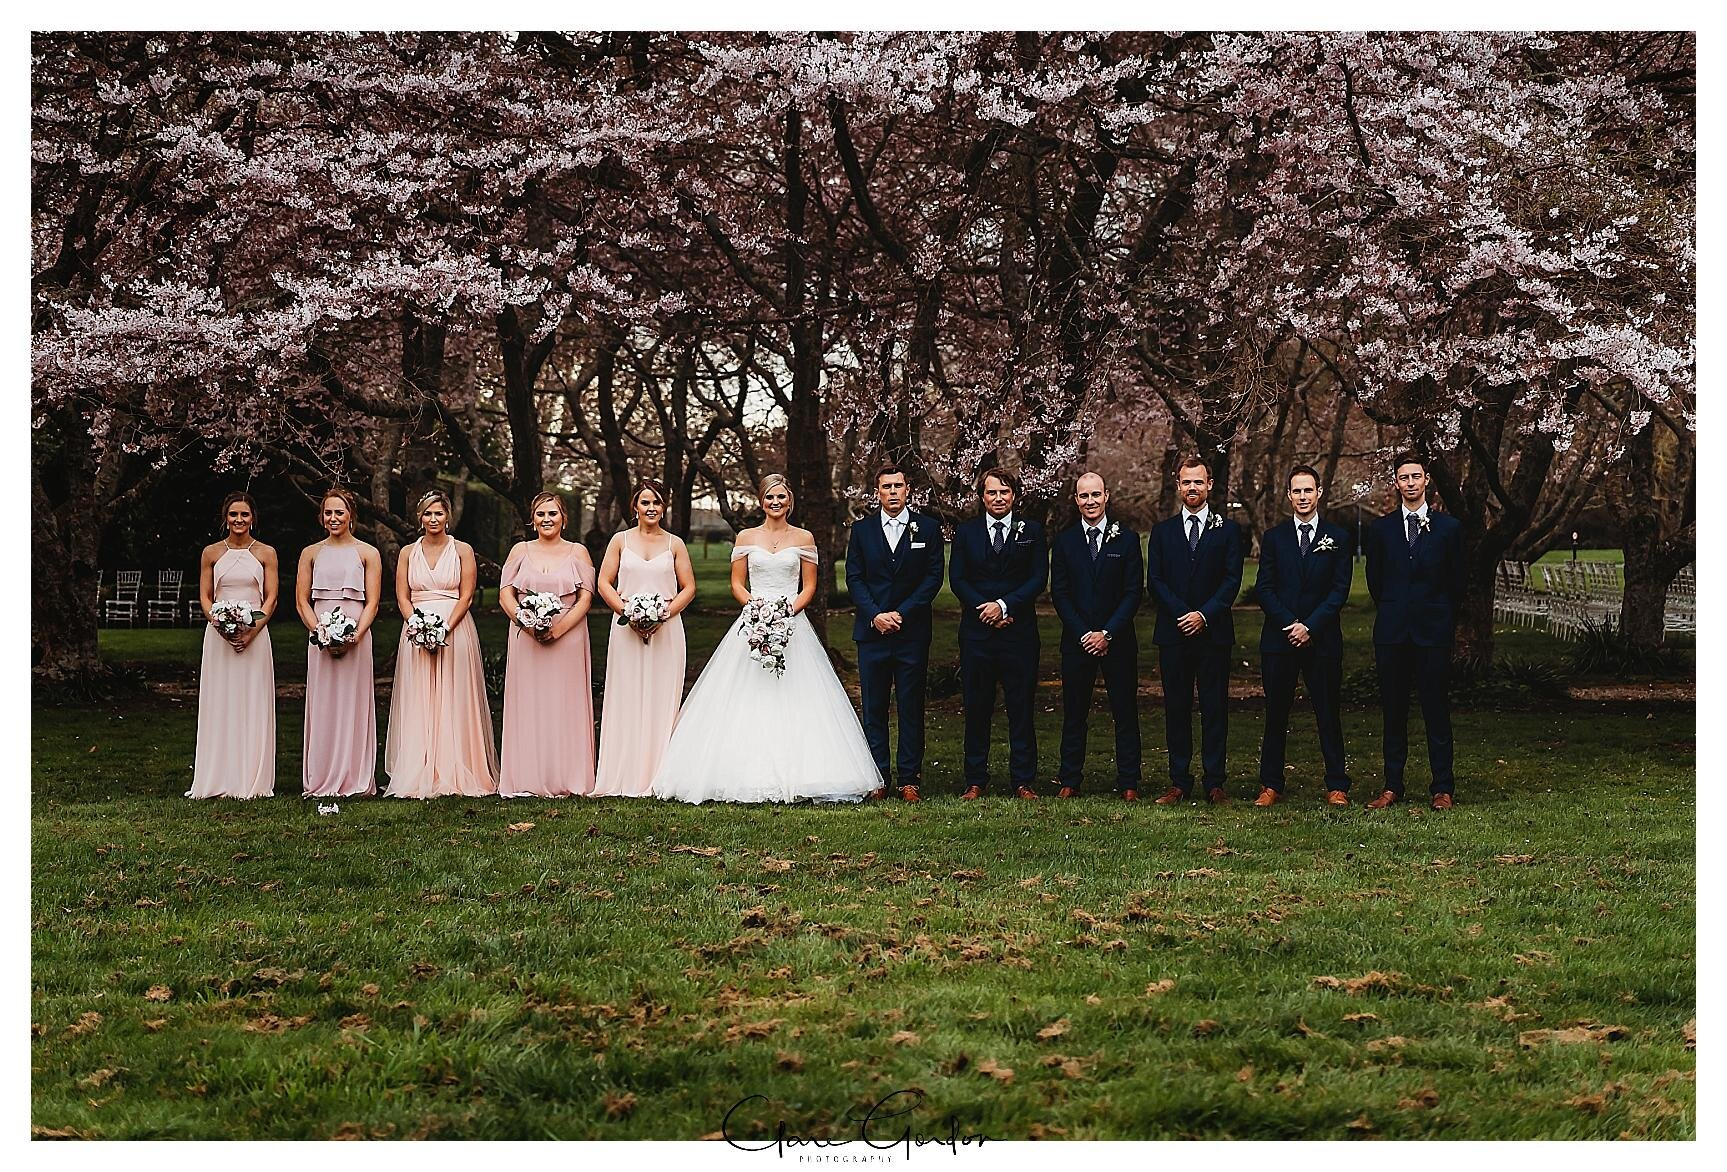 Henley-Hotel-Cherry-blossom-wedding-photos (58).jpg